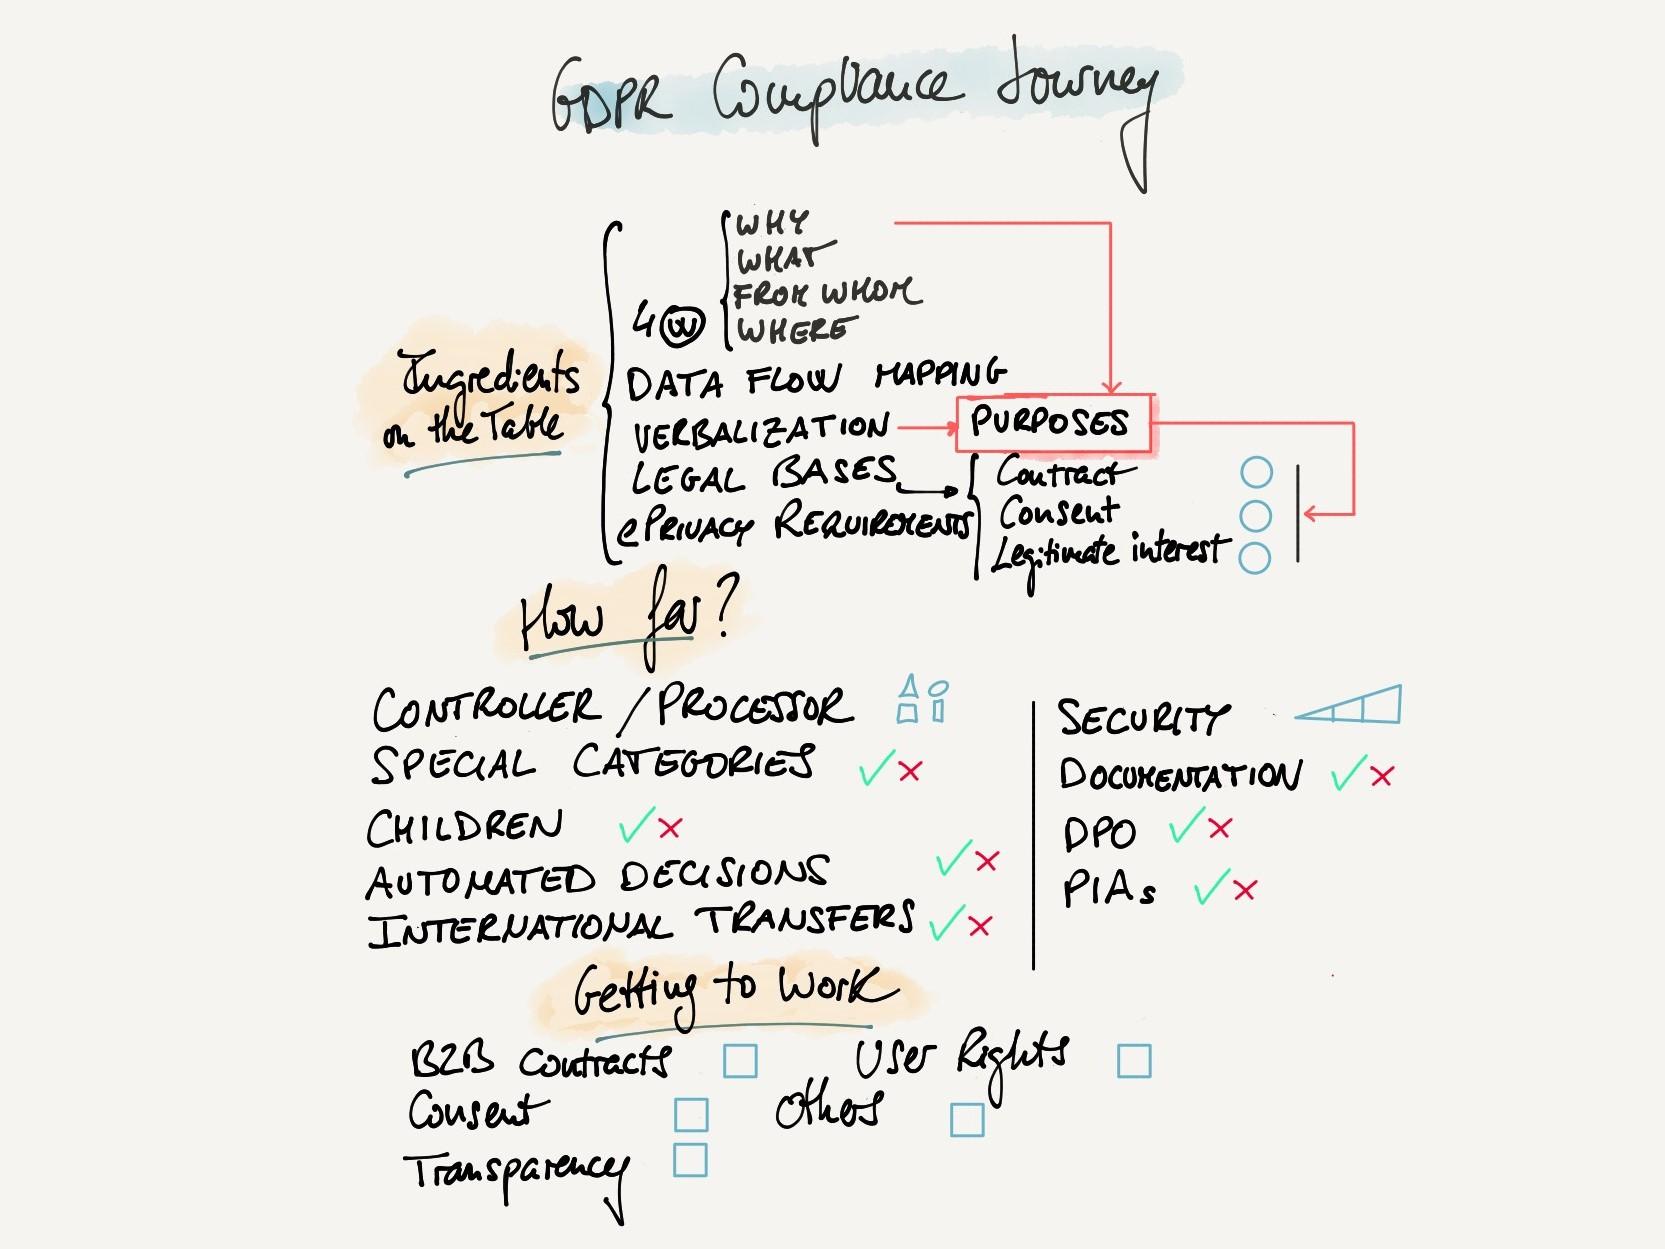 GDPR compliance cheat sheet